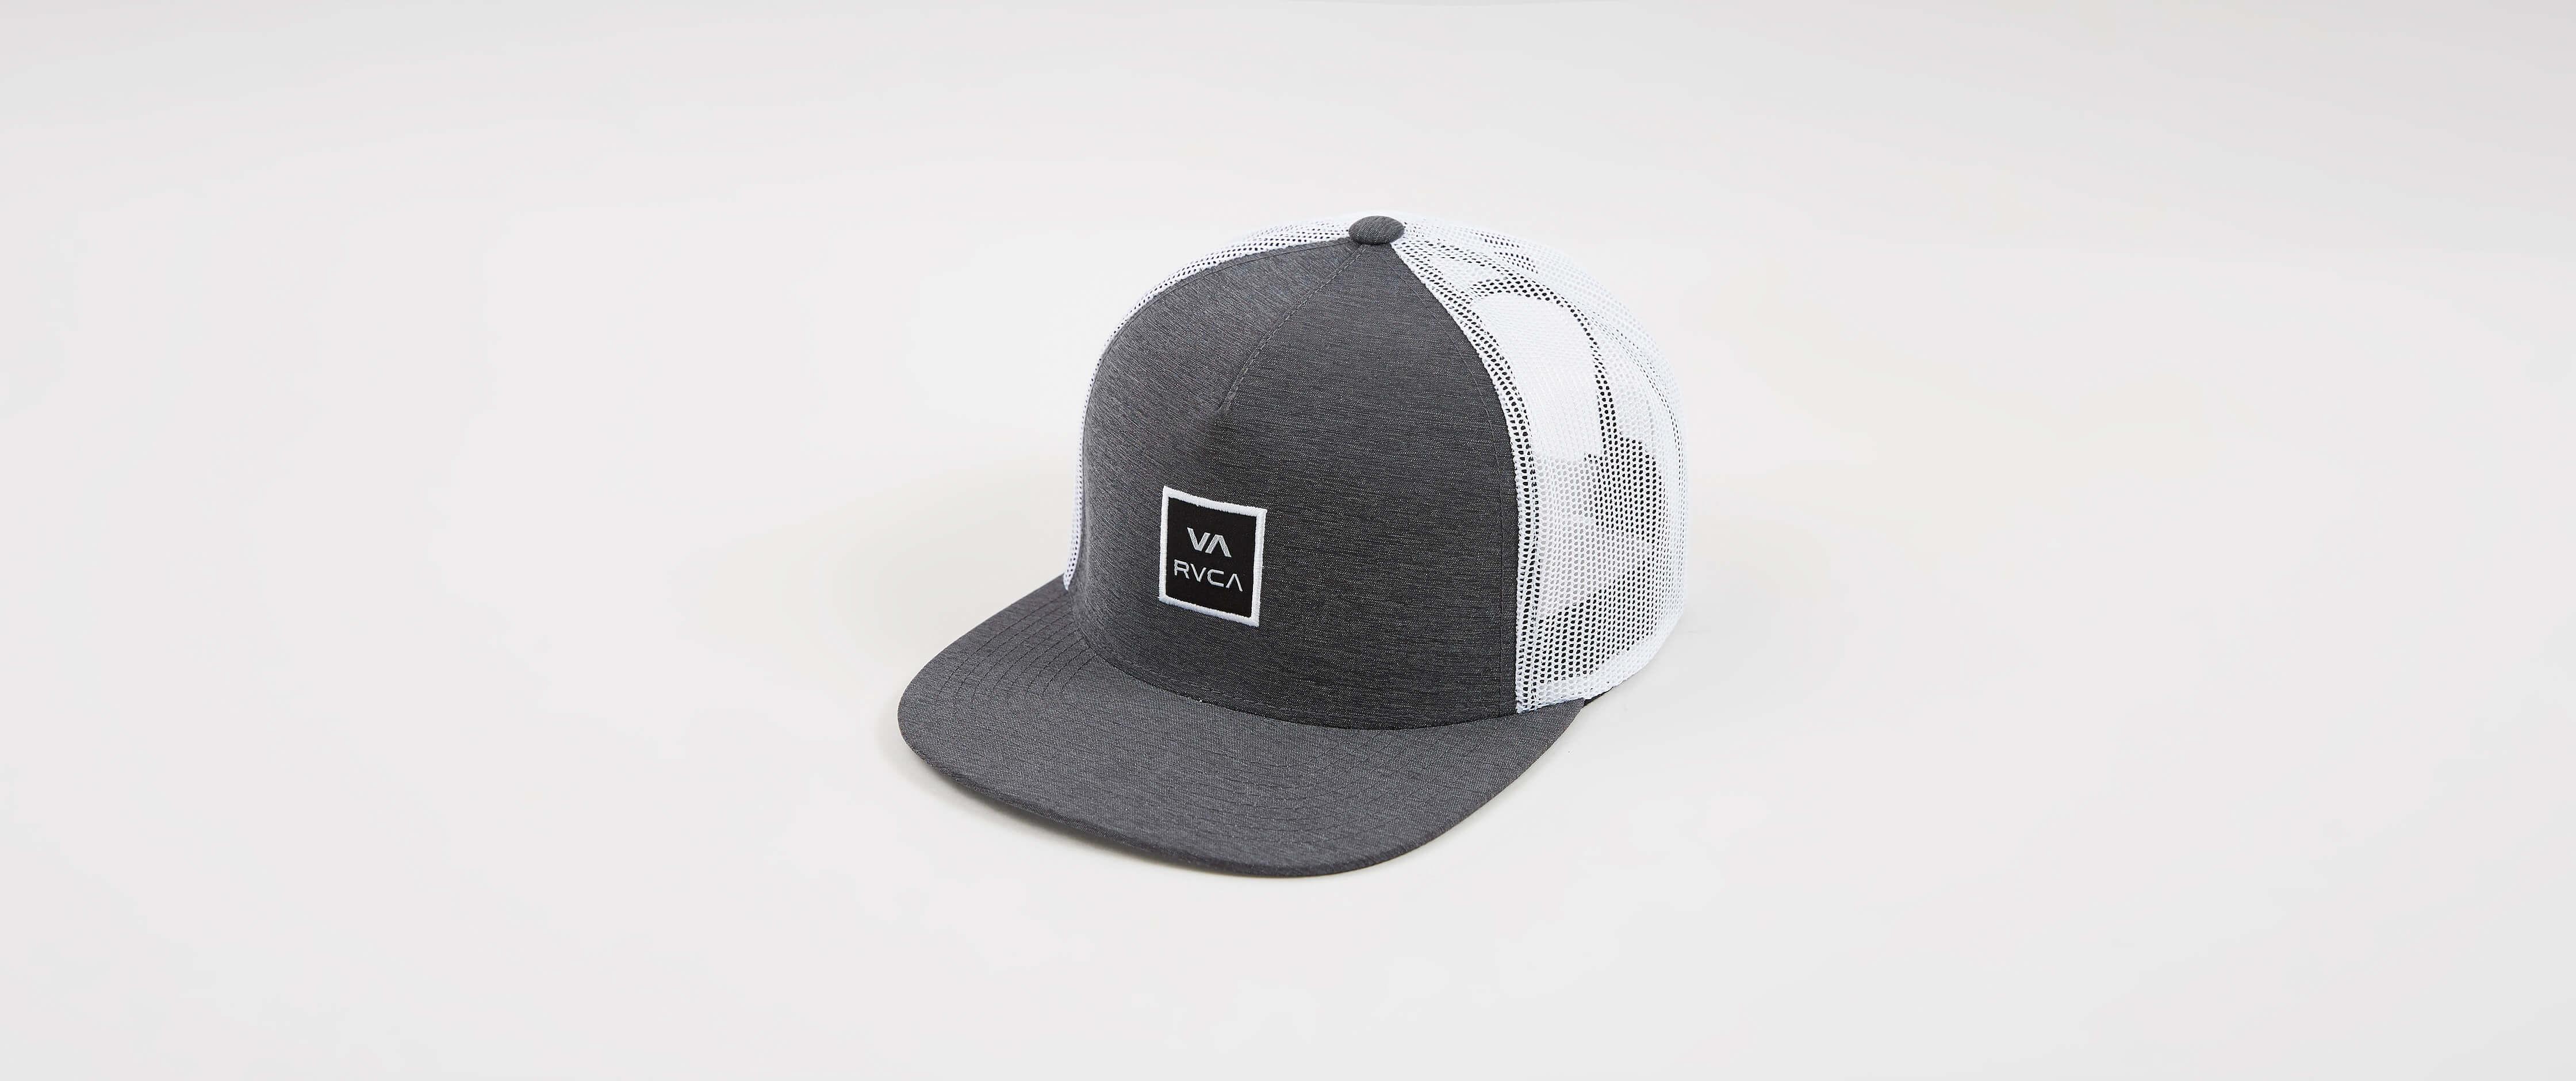 detailed look b8779 17024 RVCA Ensign Trucker Hat